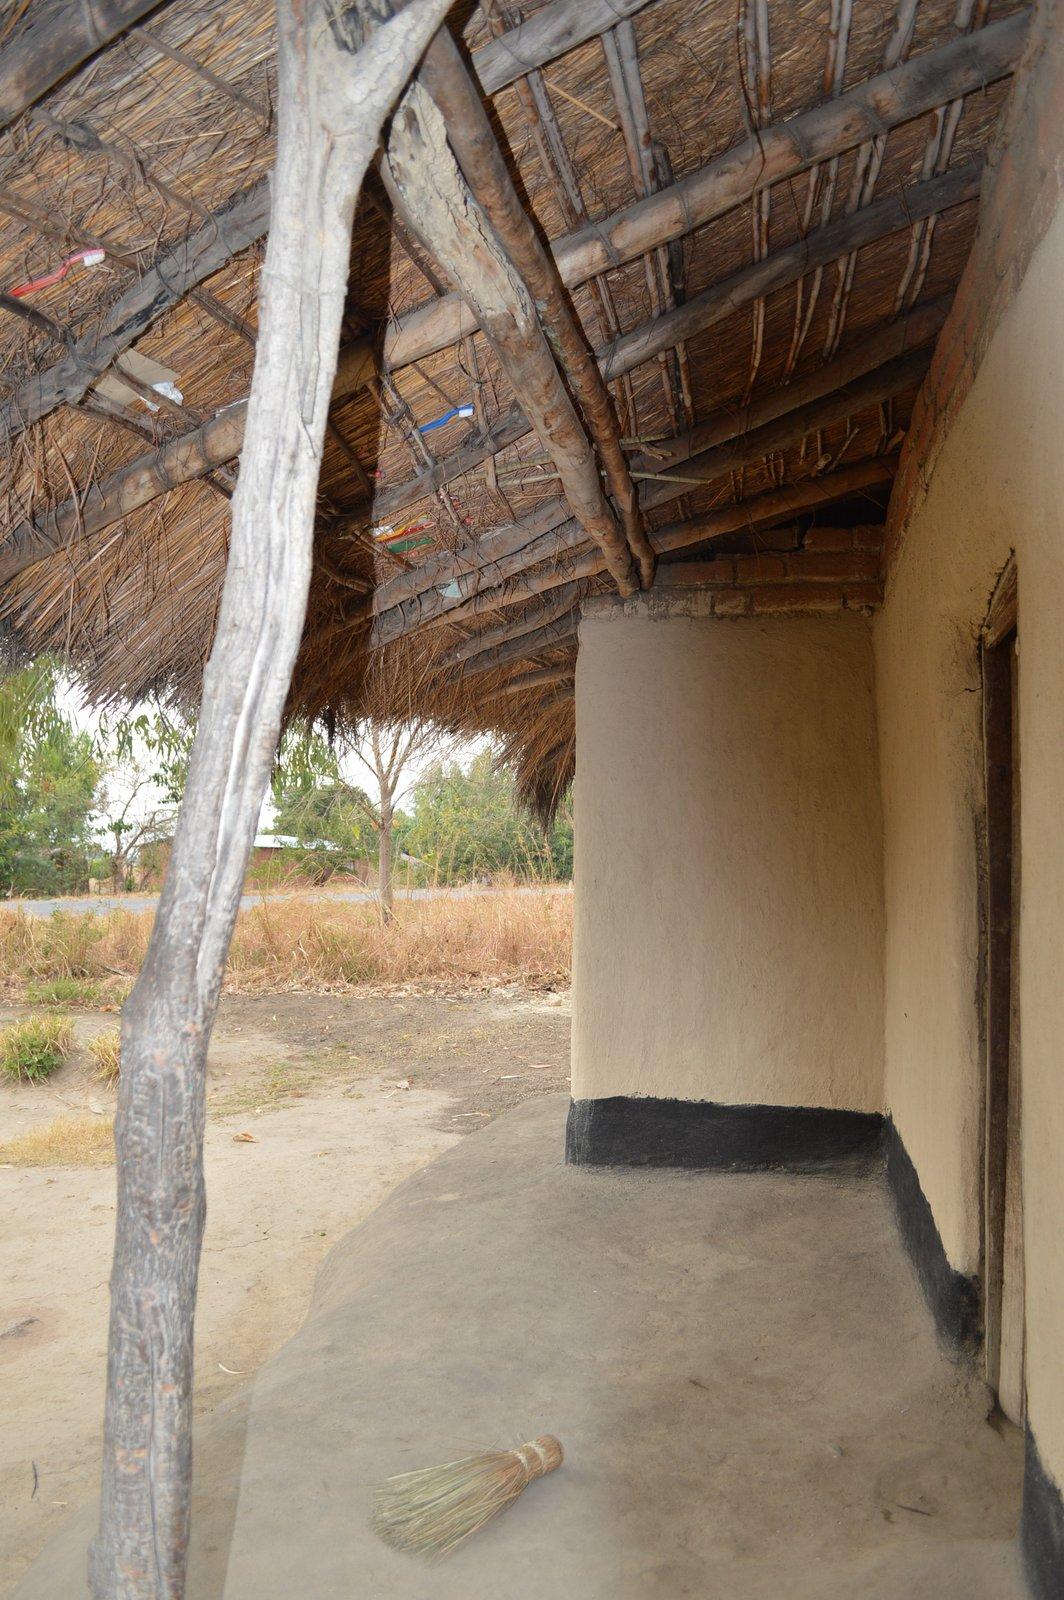 Choveka, Nkhata Bay (7).JPG